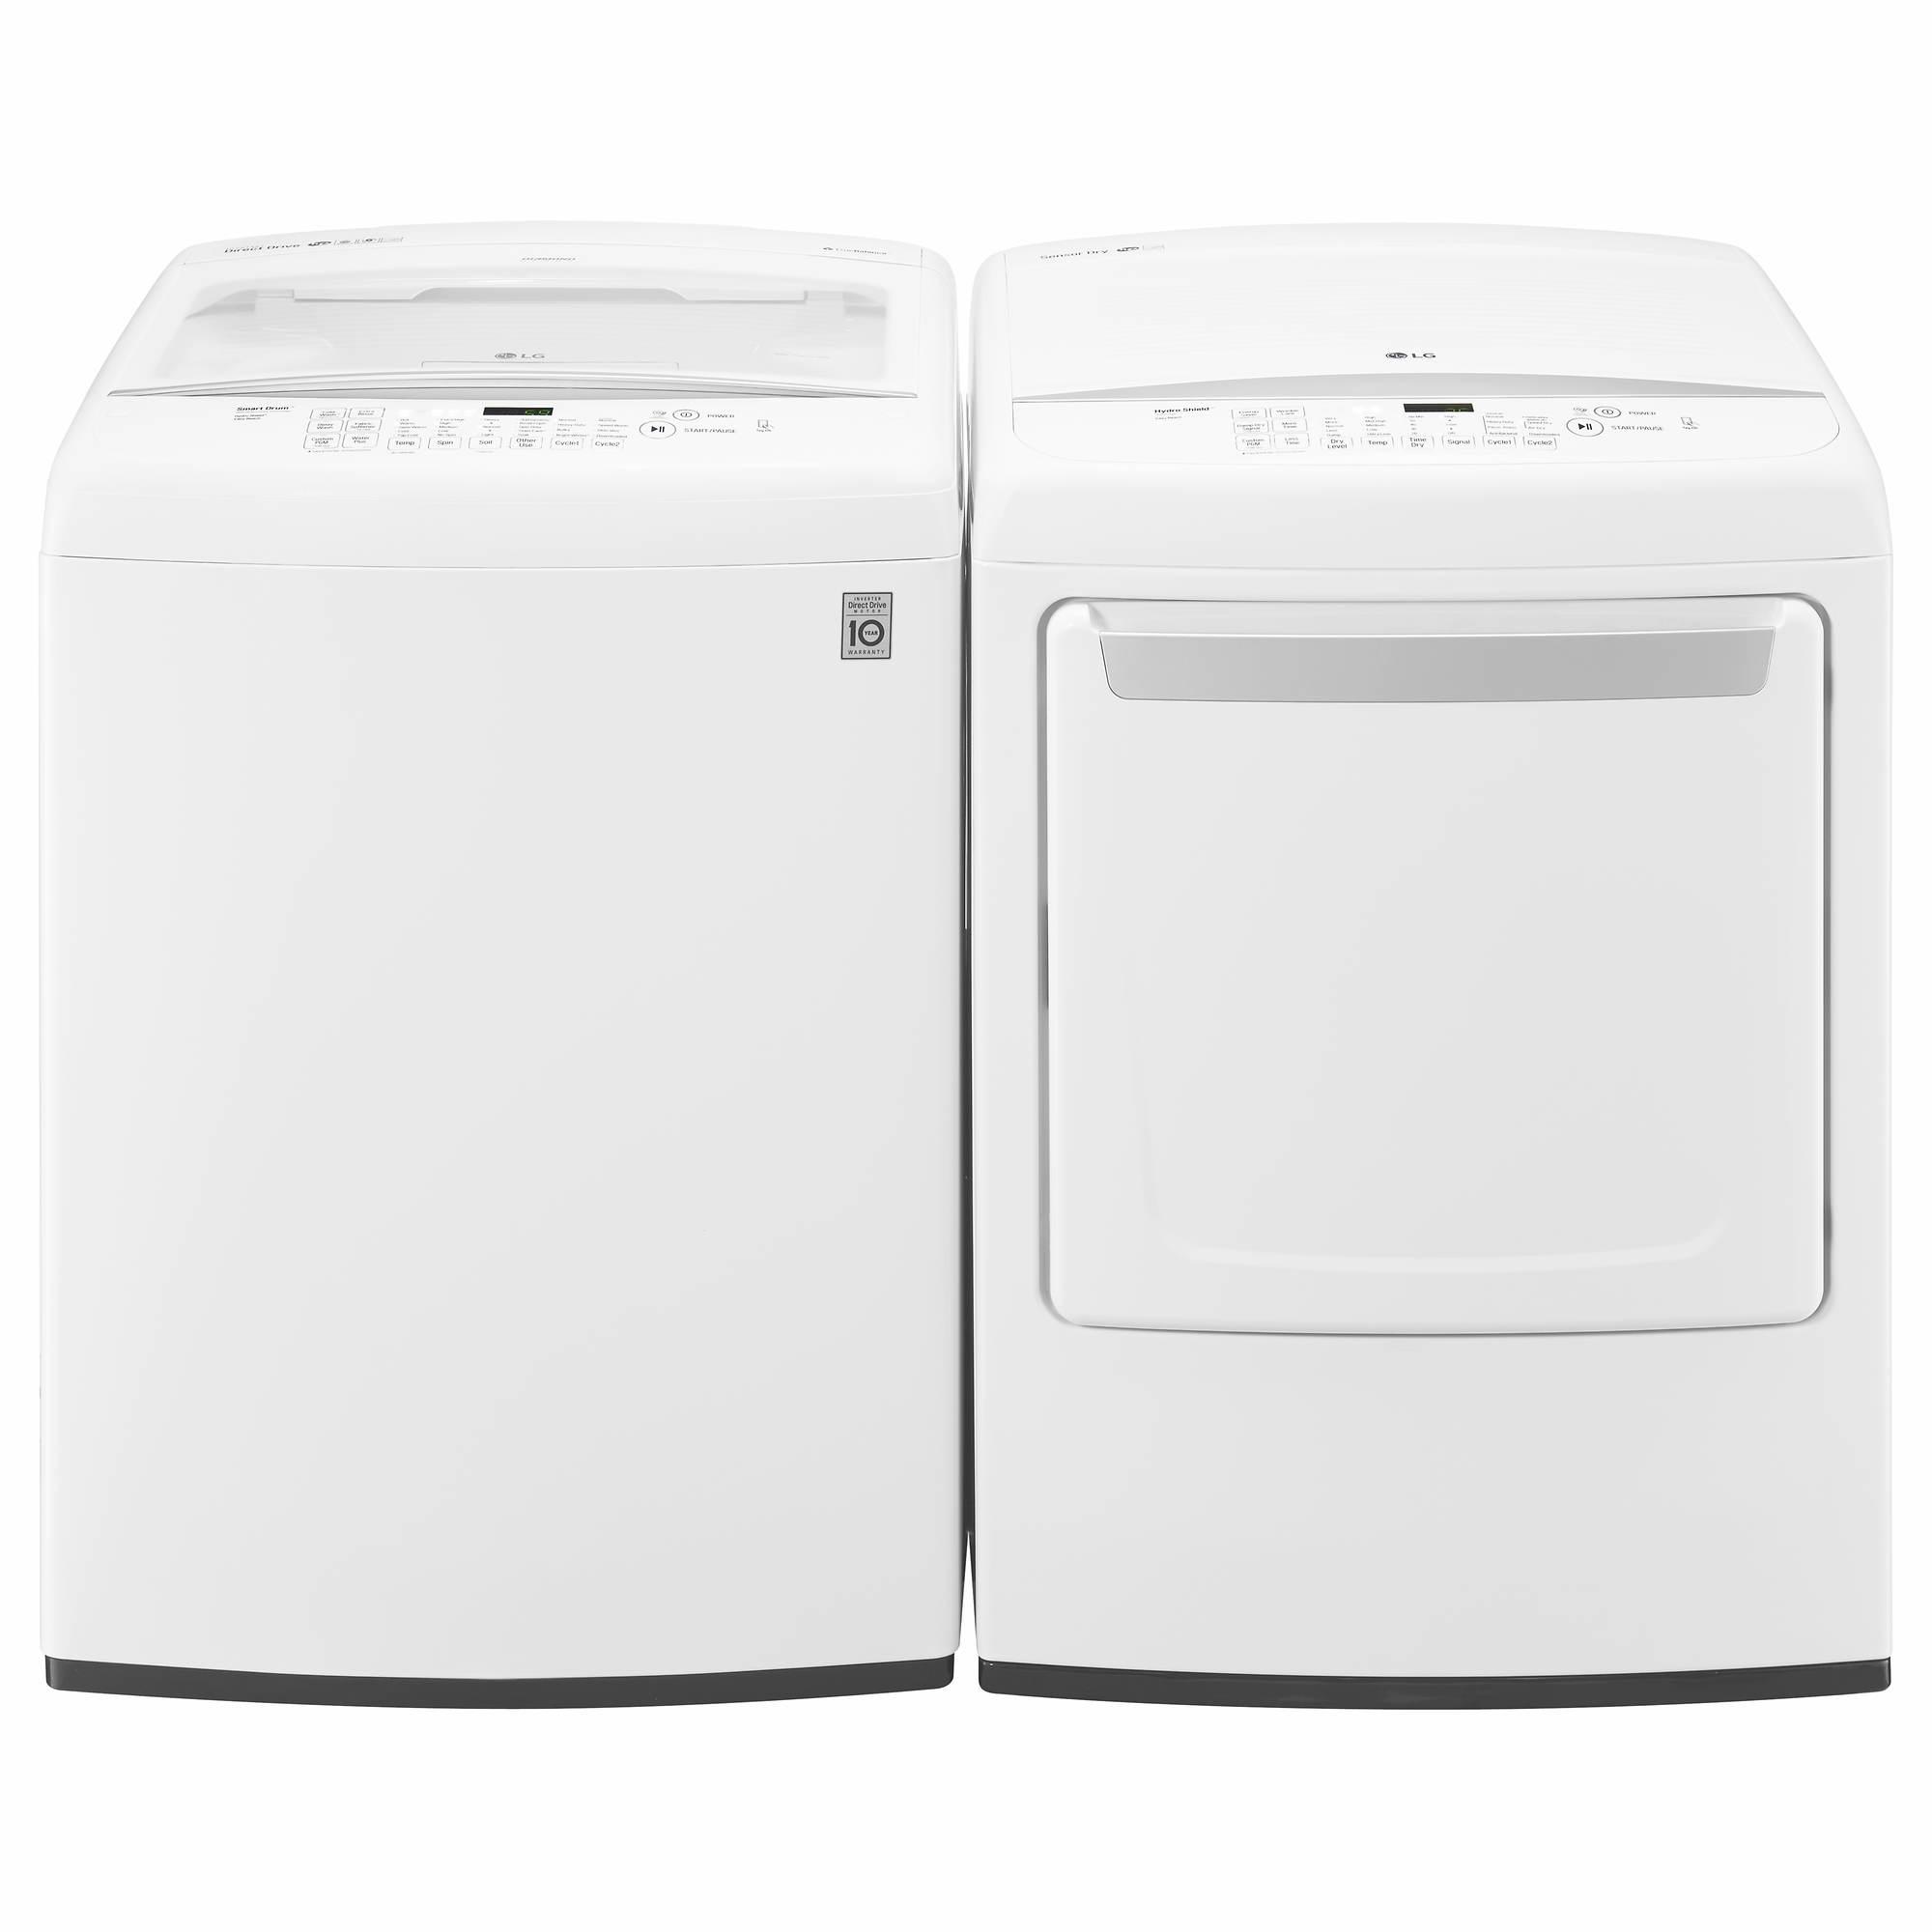 Lg Sensor Dryer ~ Lg top load turbowash washer and sensor dry electric dryer